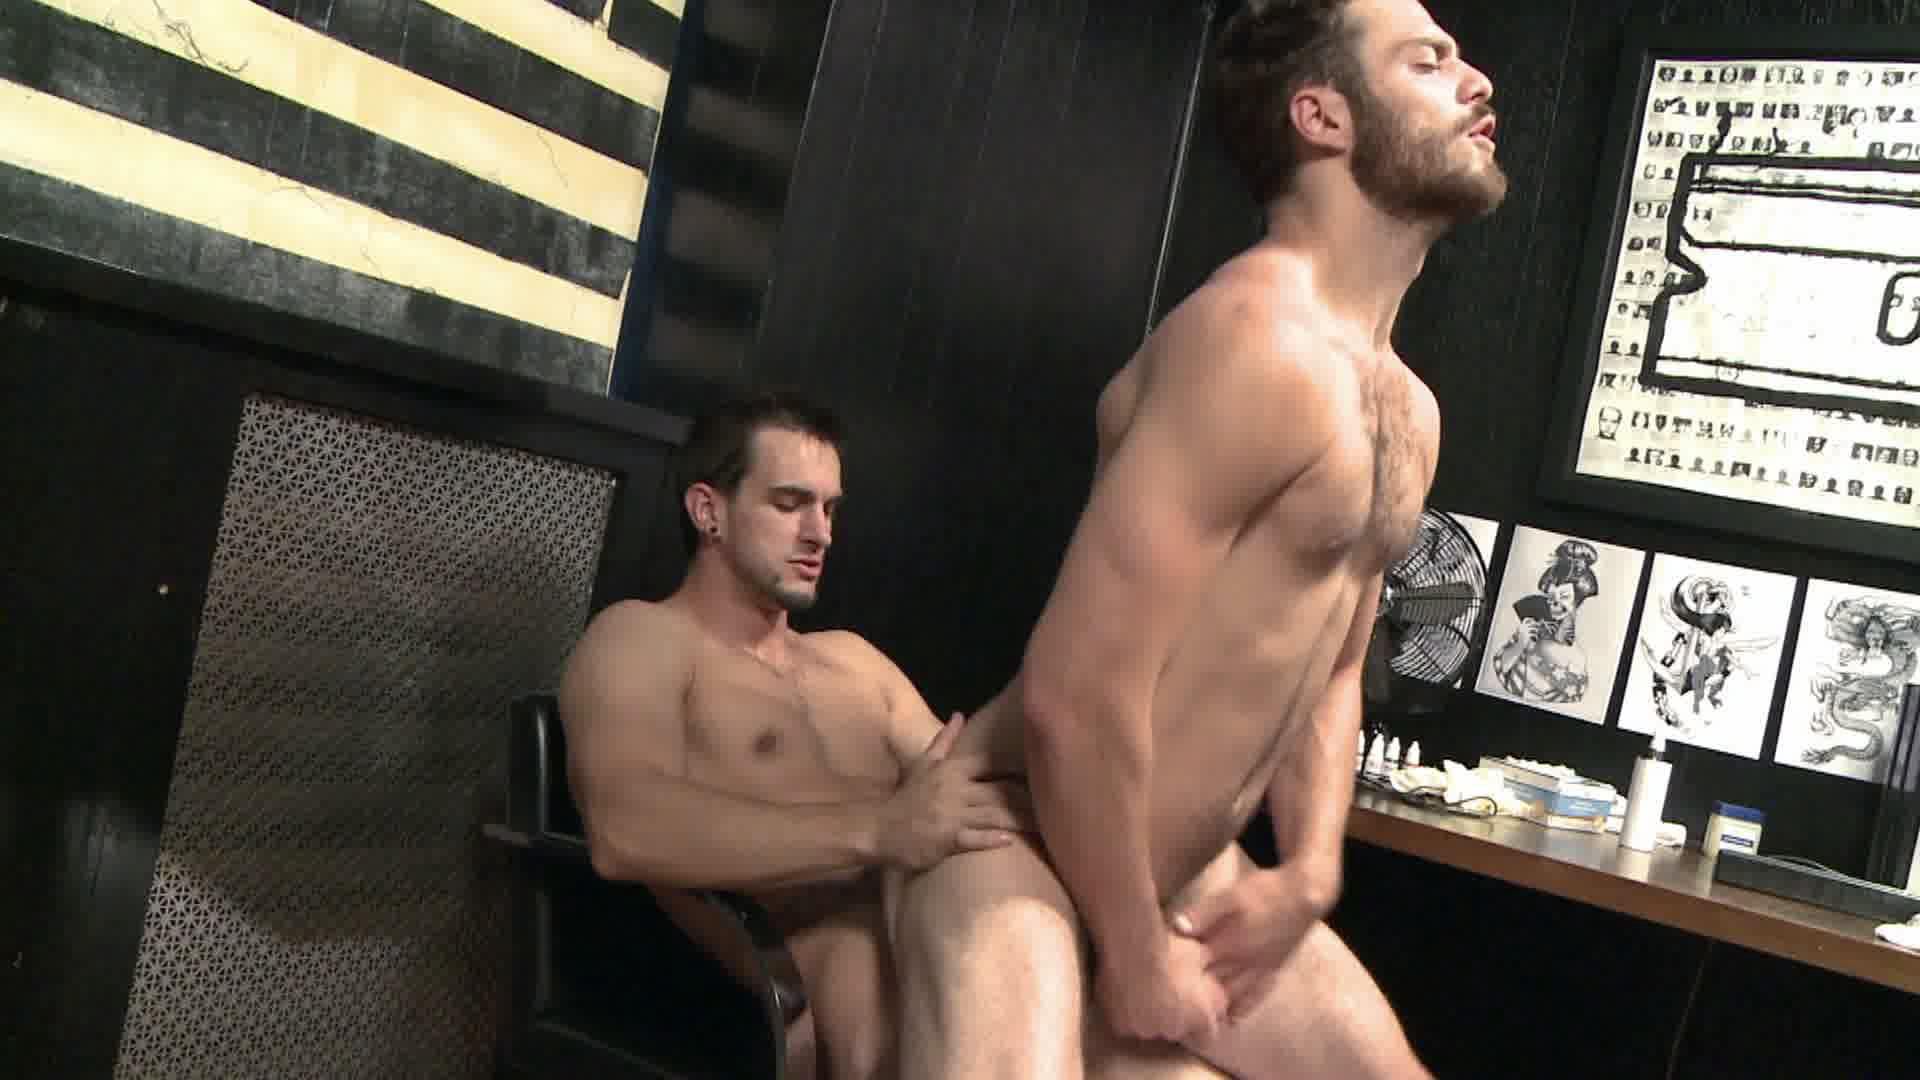 Golden Gate Season 4 Episode 4: The Phenix Nest Xvideo gay